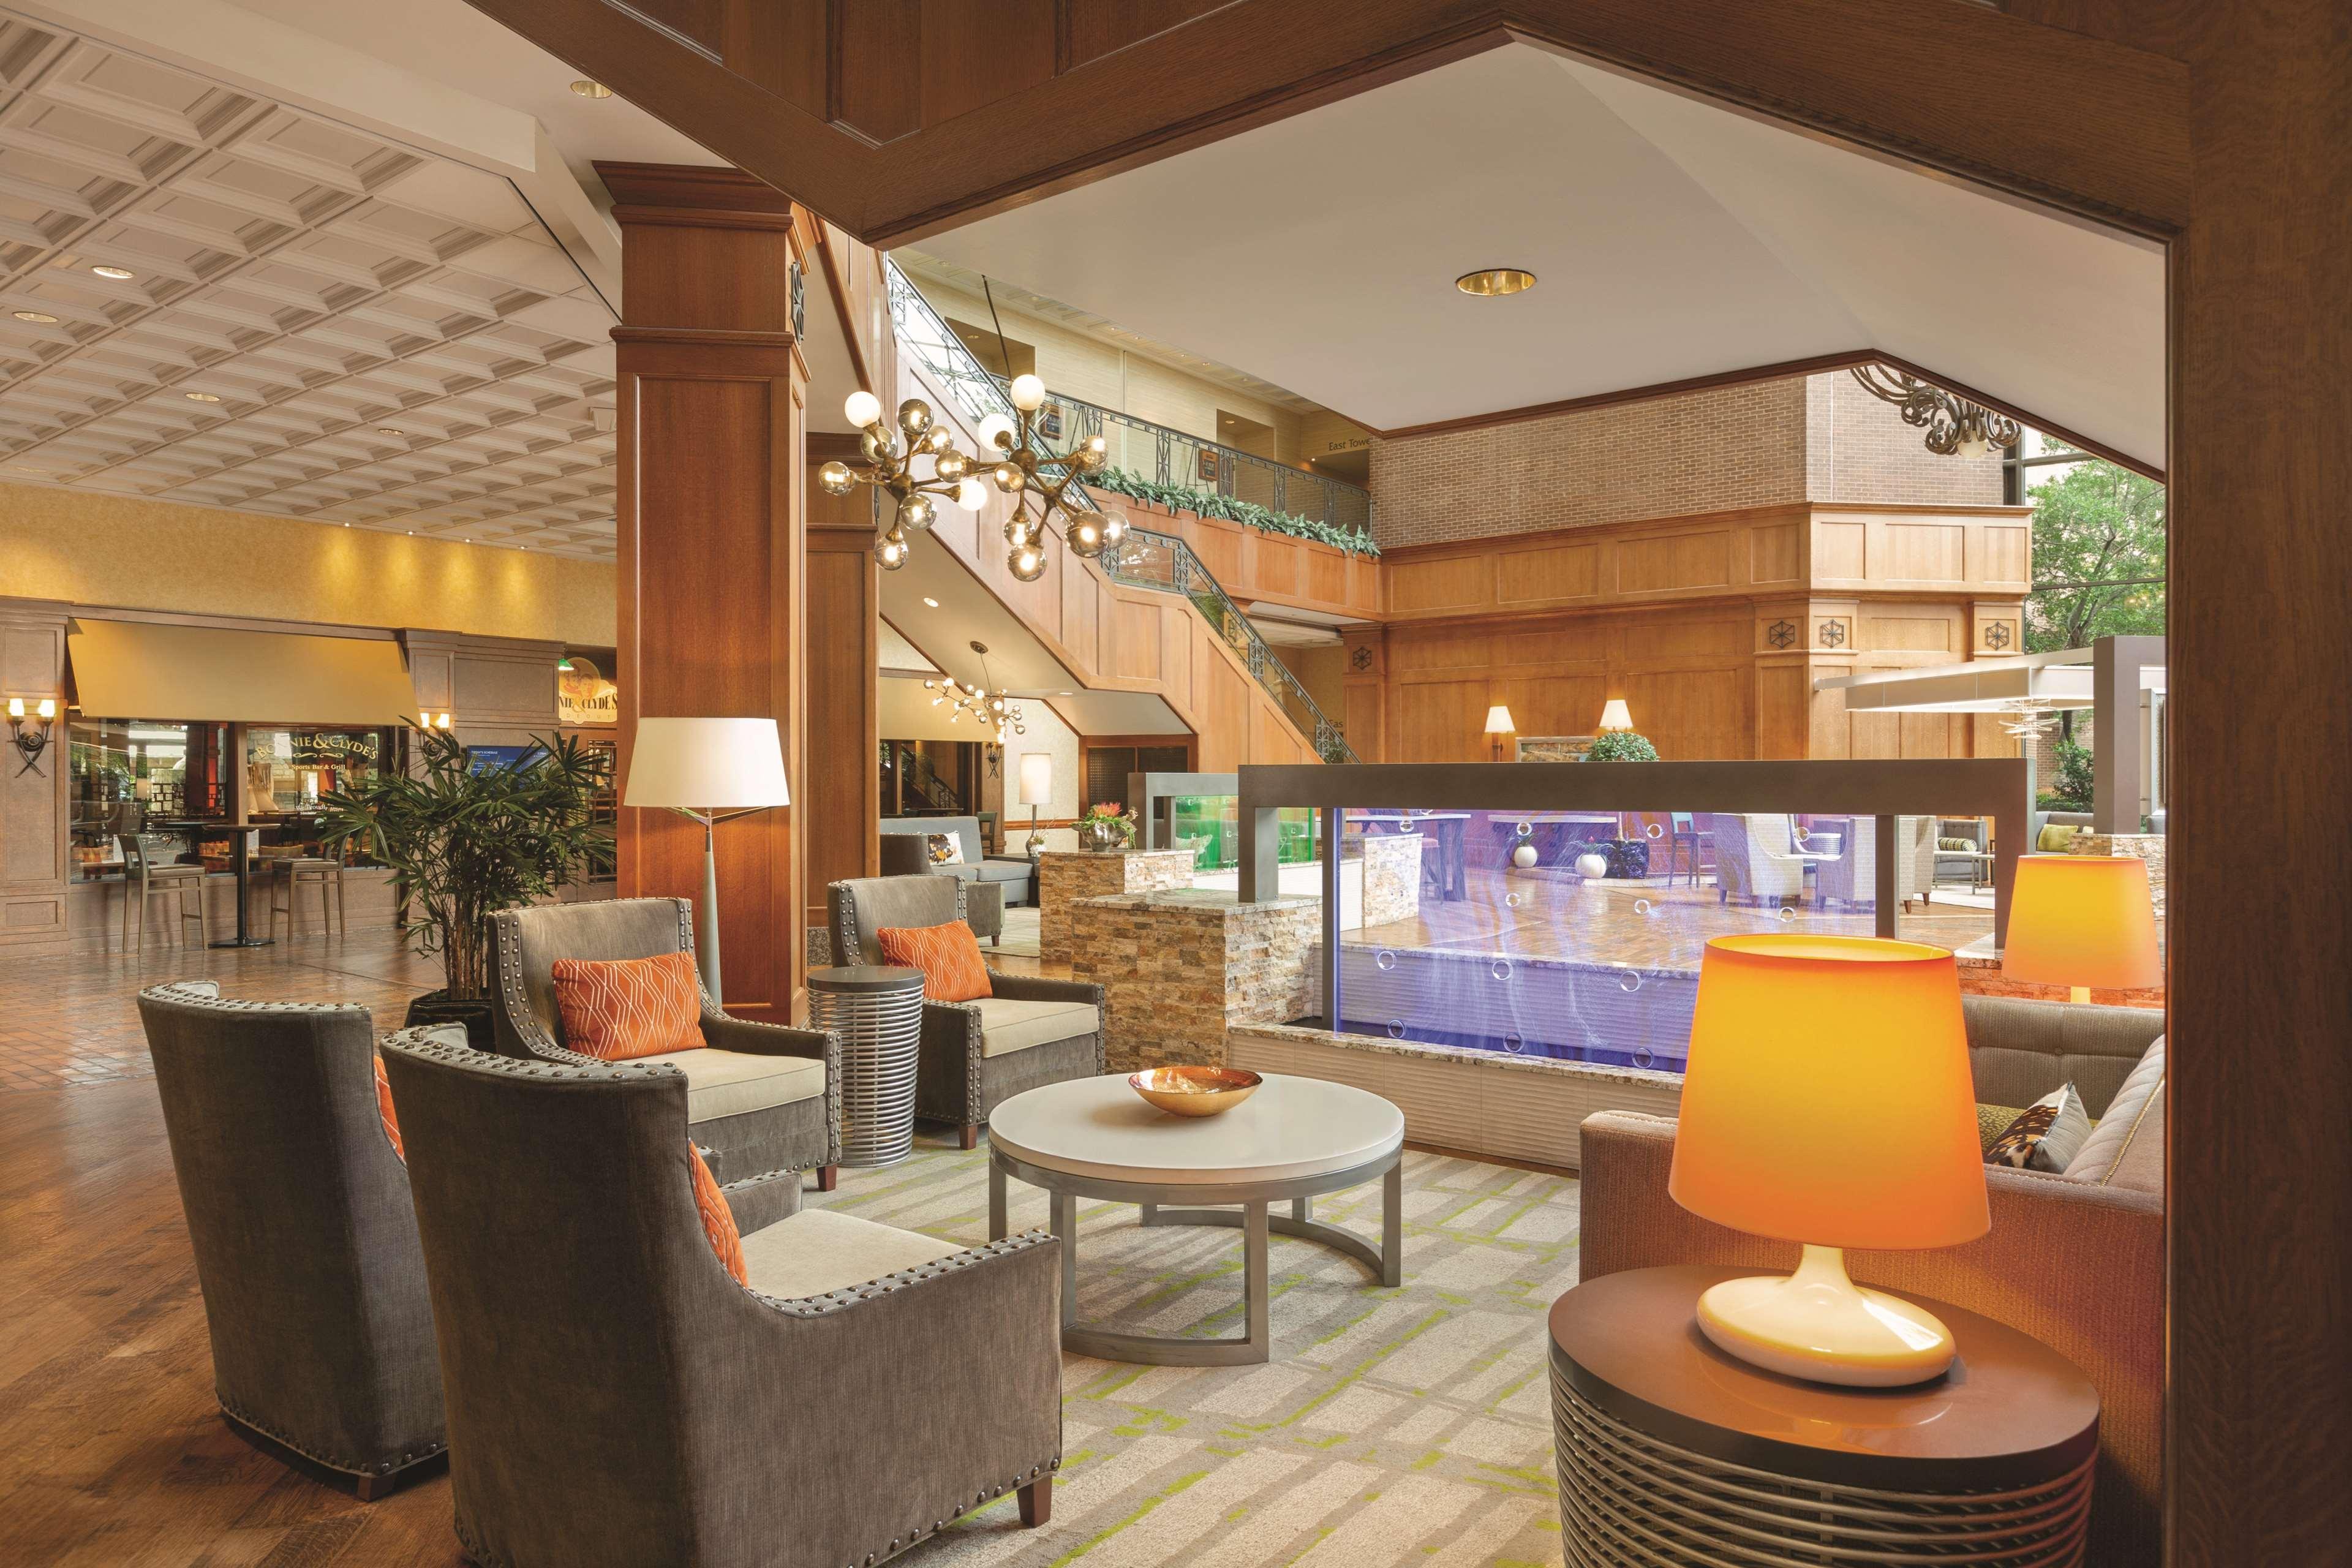 Hilton DFW Lakes Executive Conference Center image 6